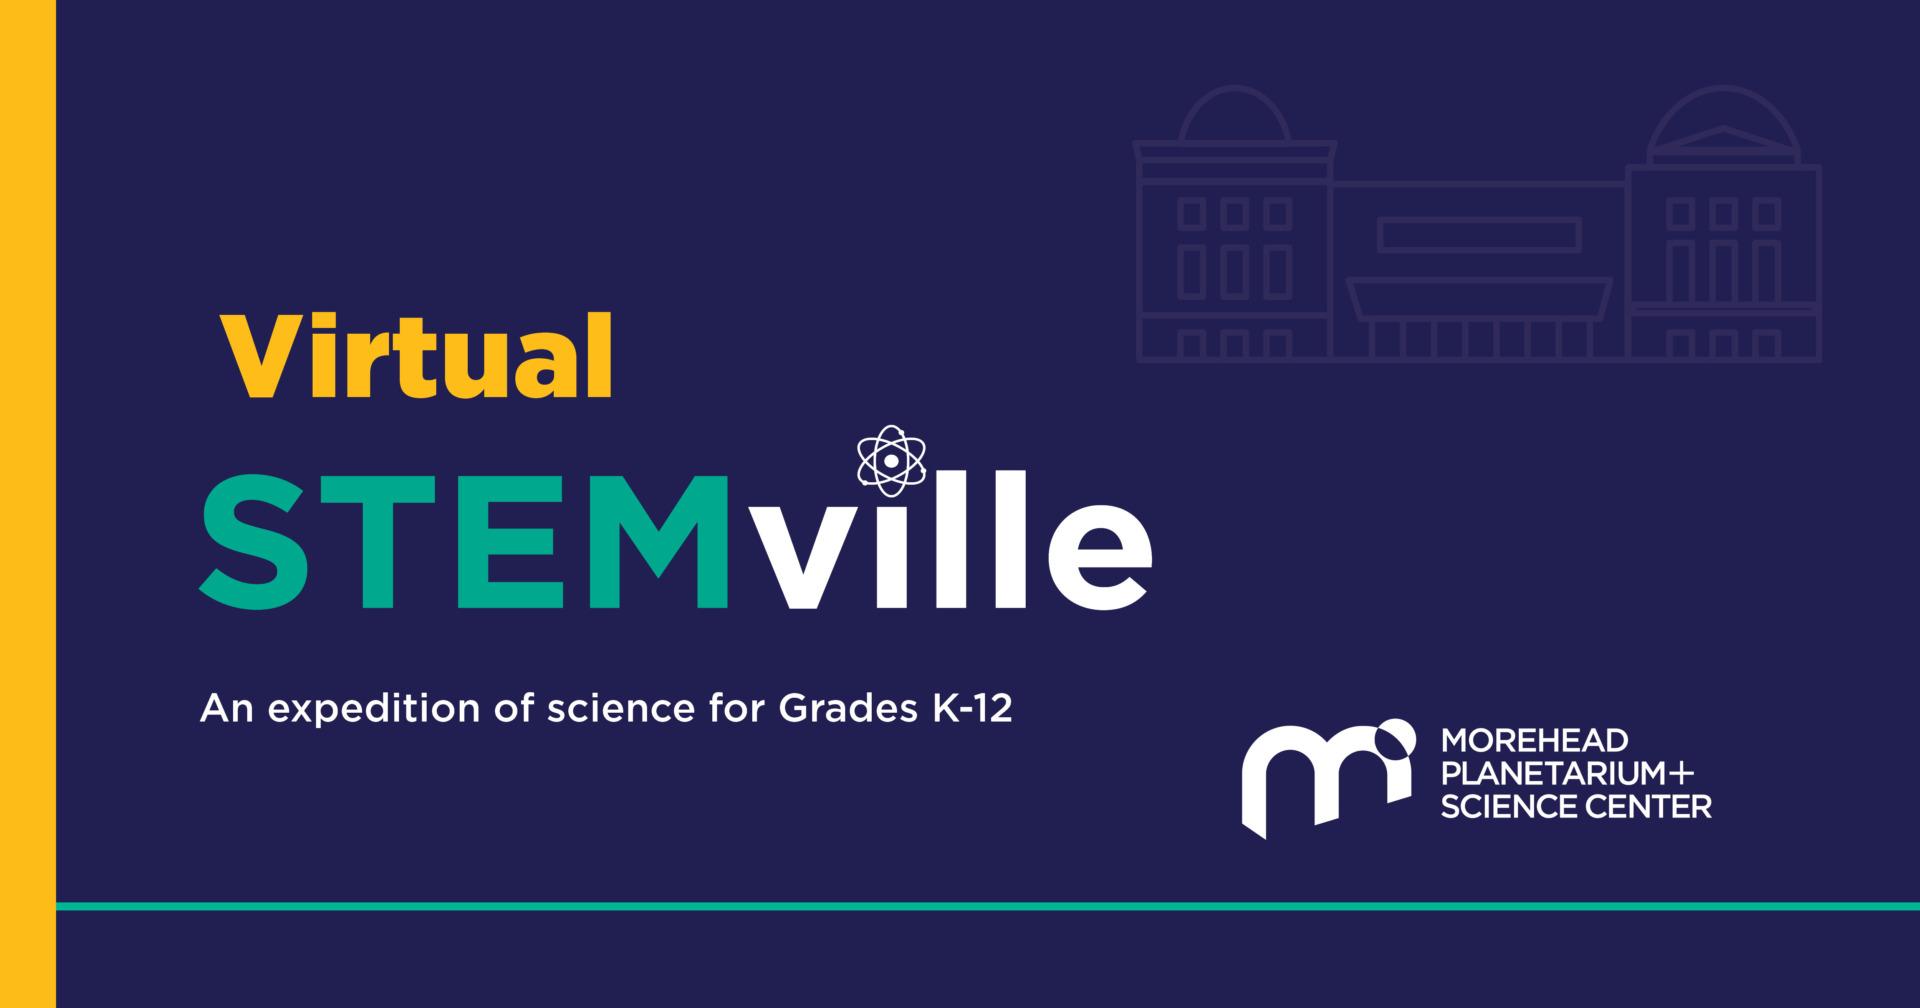 Virtual STEMville